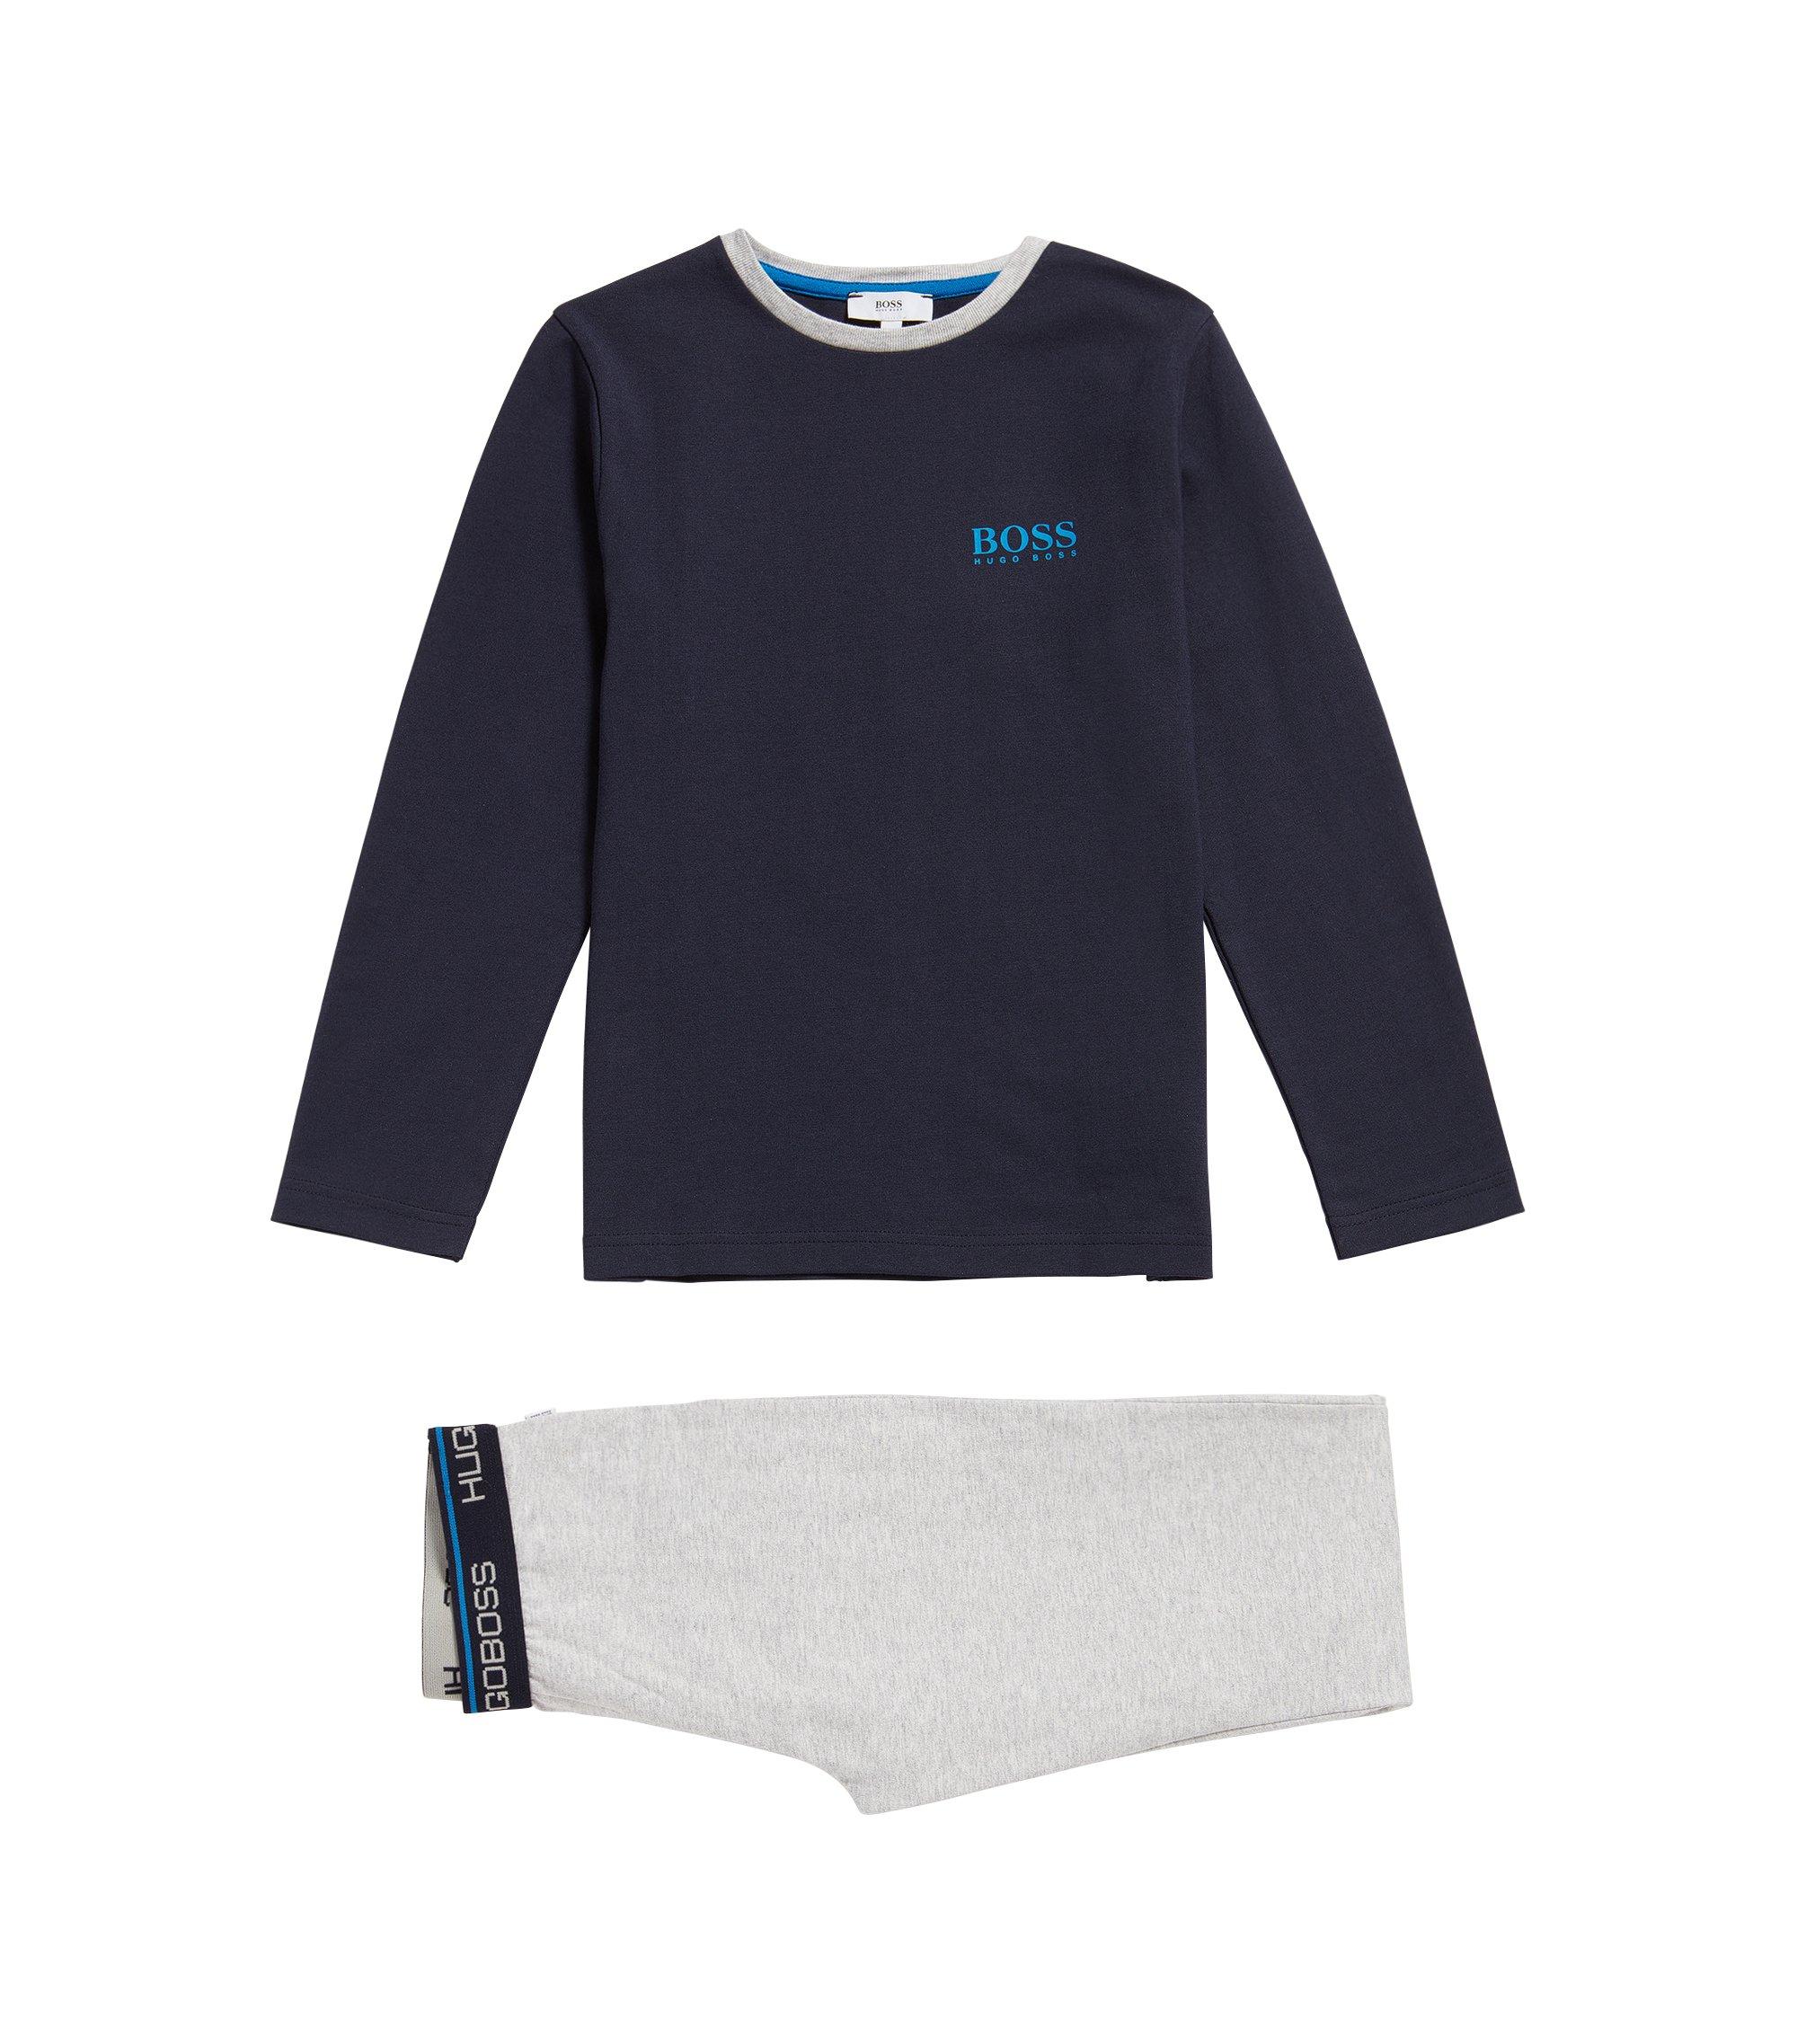 Kids' cotton pyjamas with logo print: 'J28048', Patterned